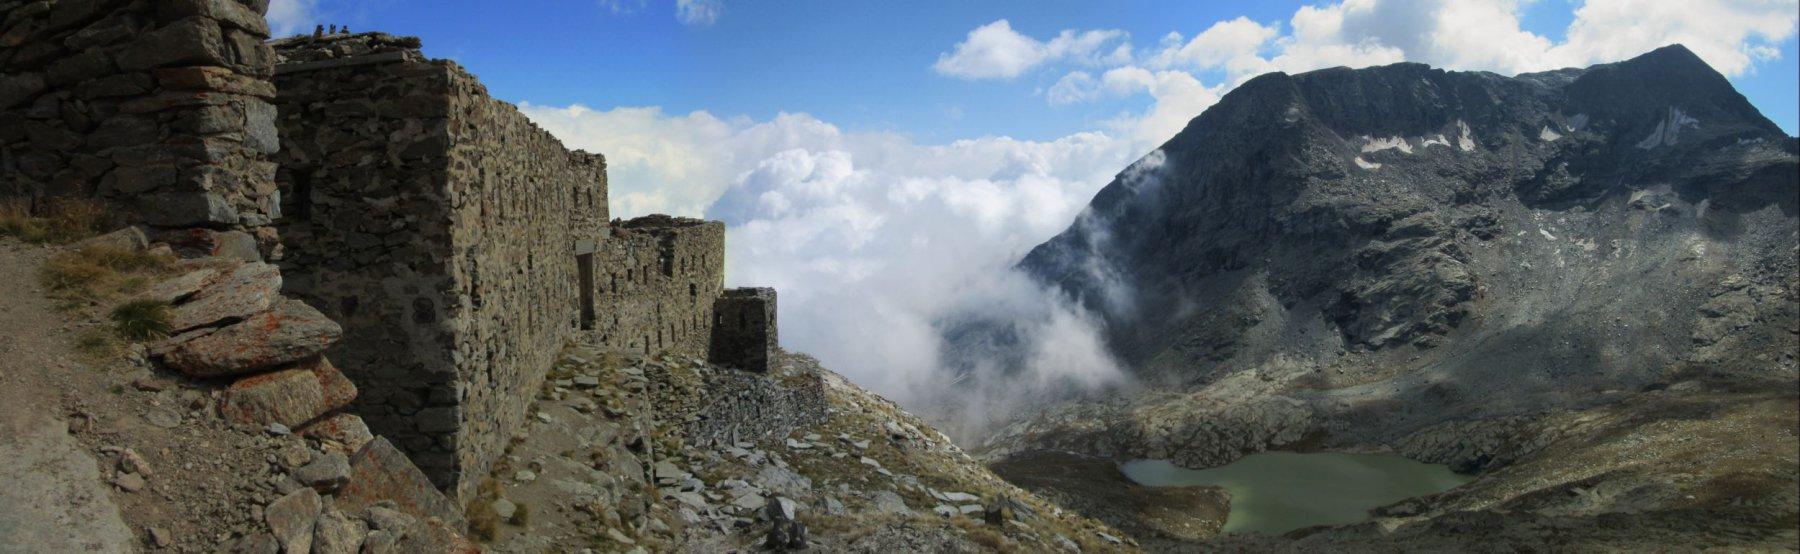 Forte di Malamot e lago Bianco